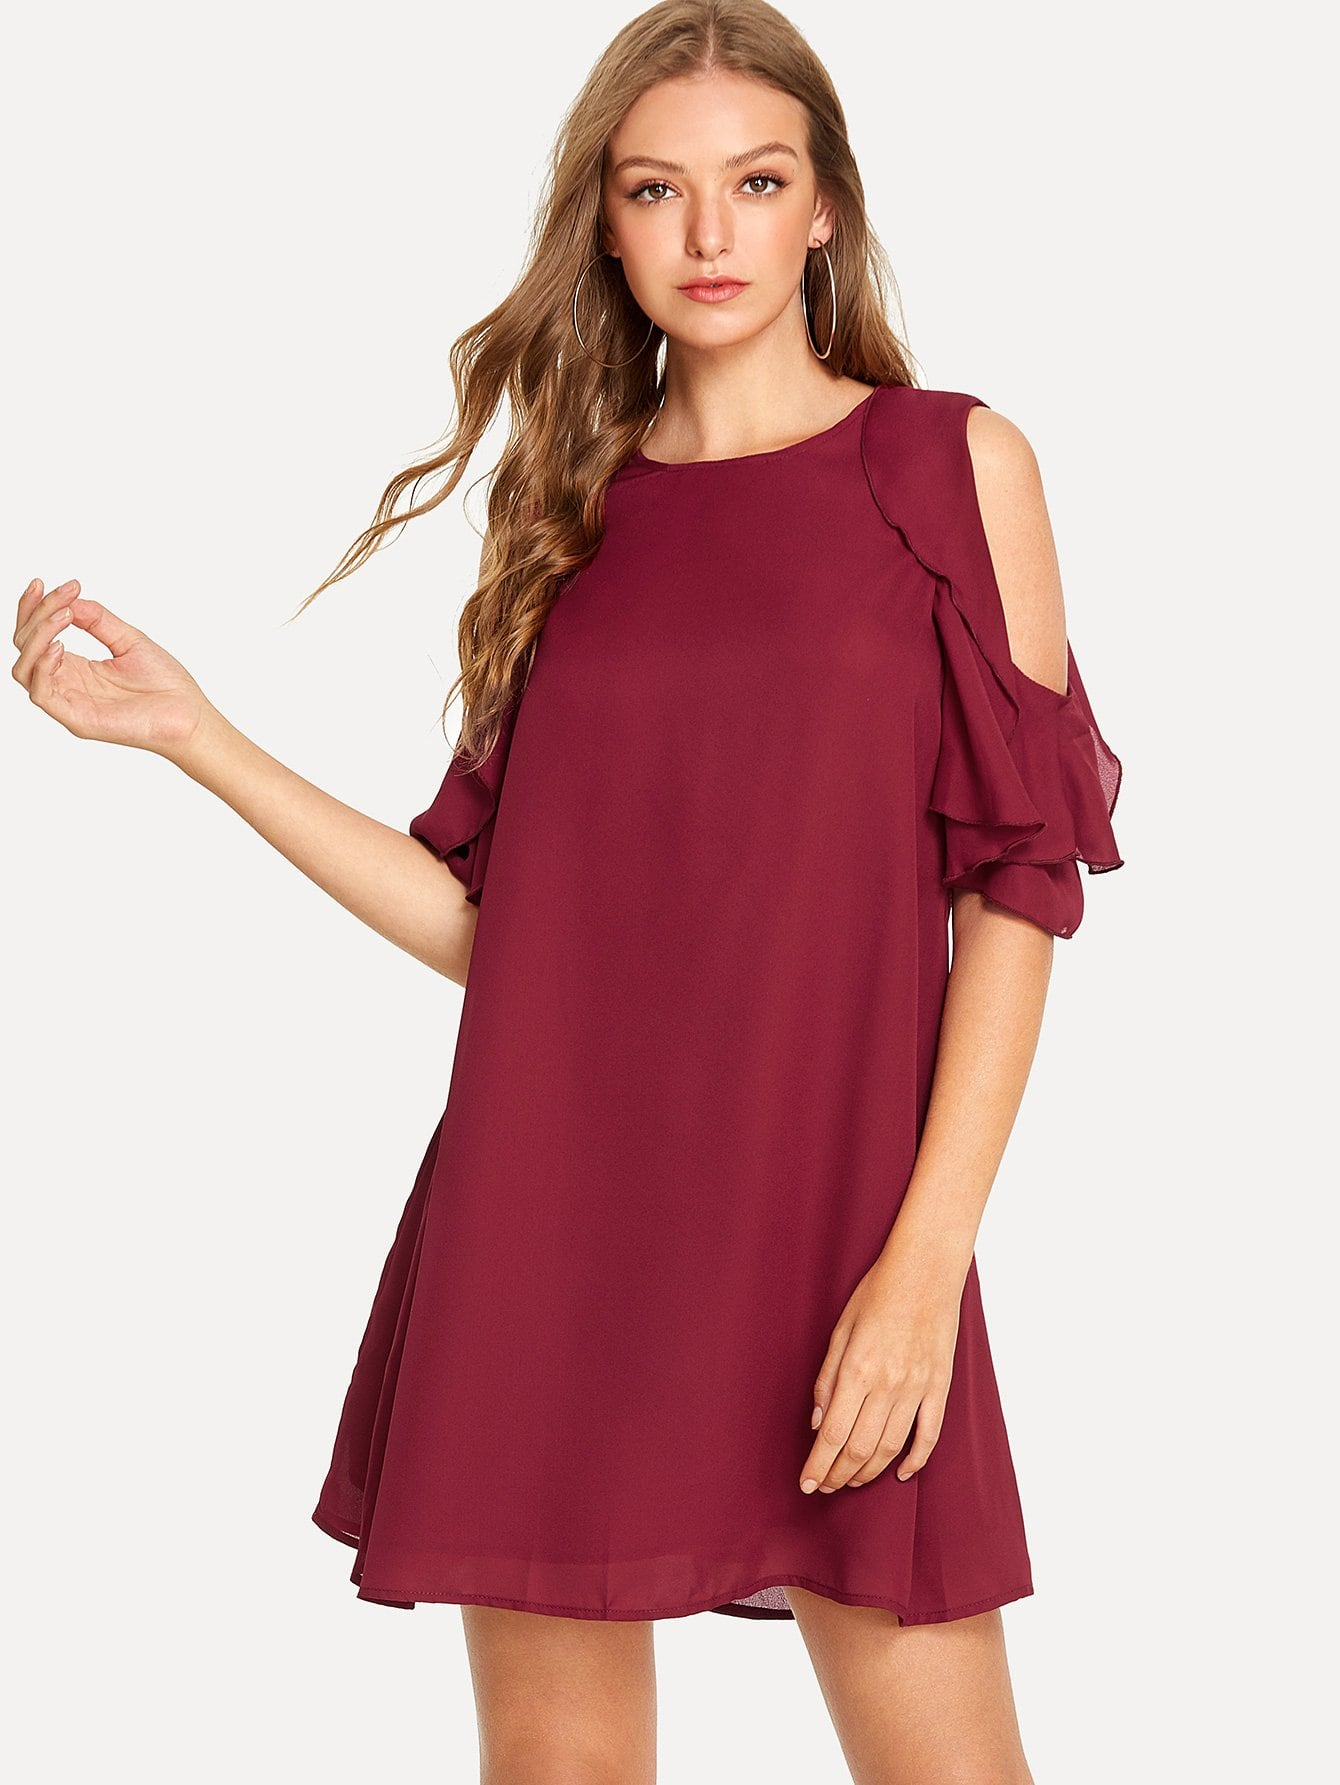 Cold Shoulder Layered Ruffle Trim Tunic Dress цена и фото